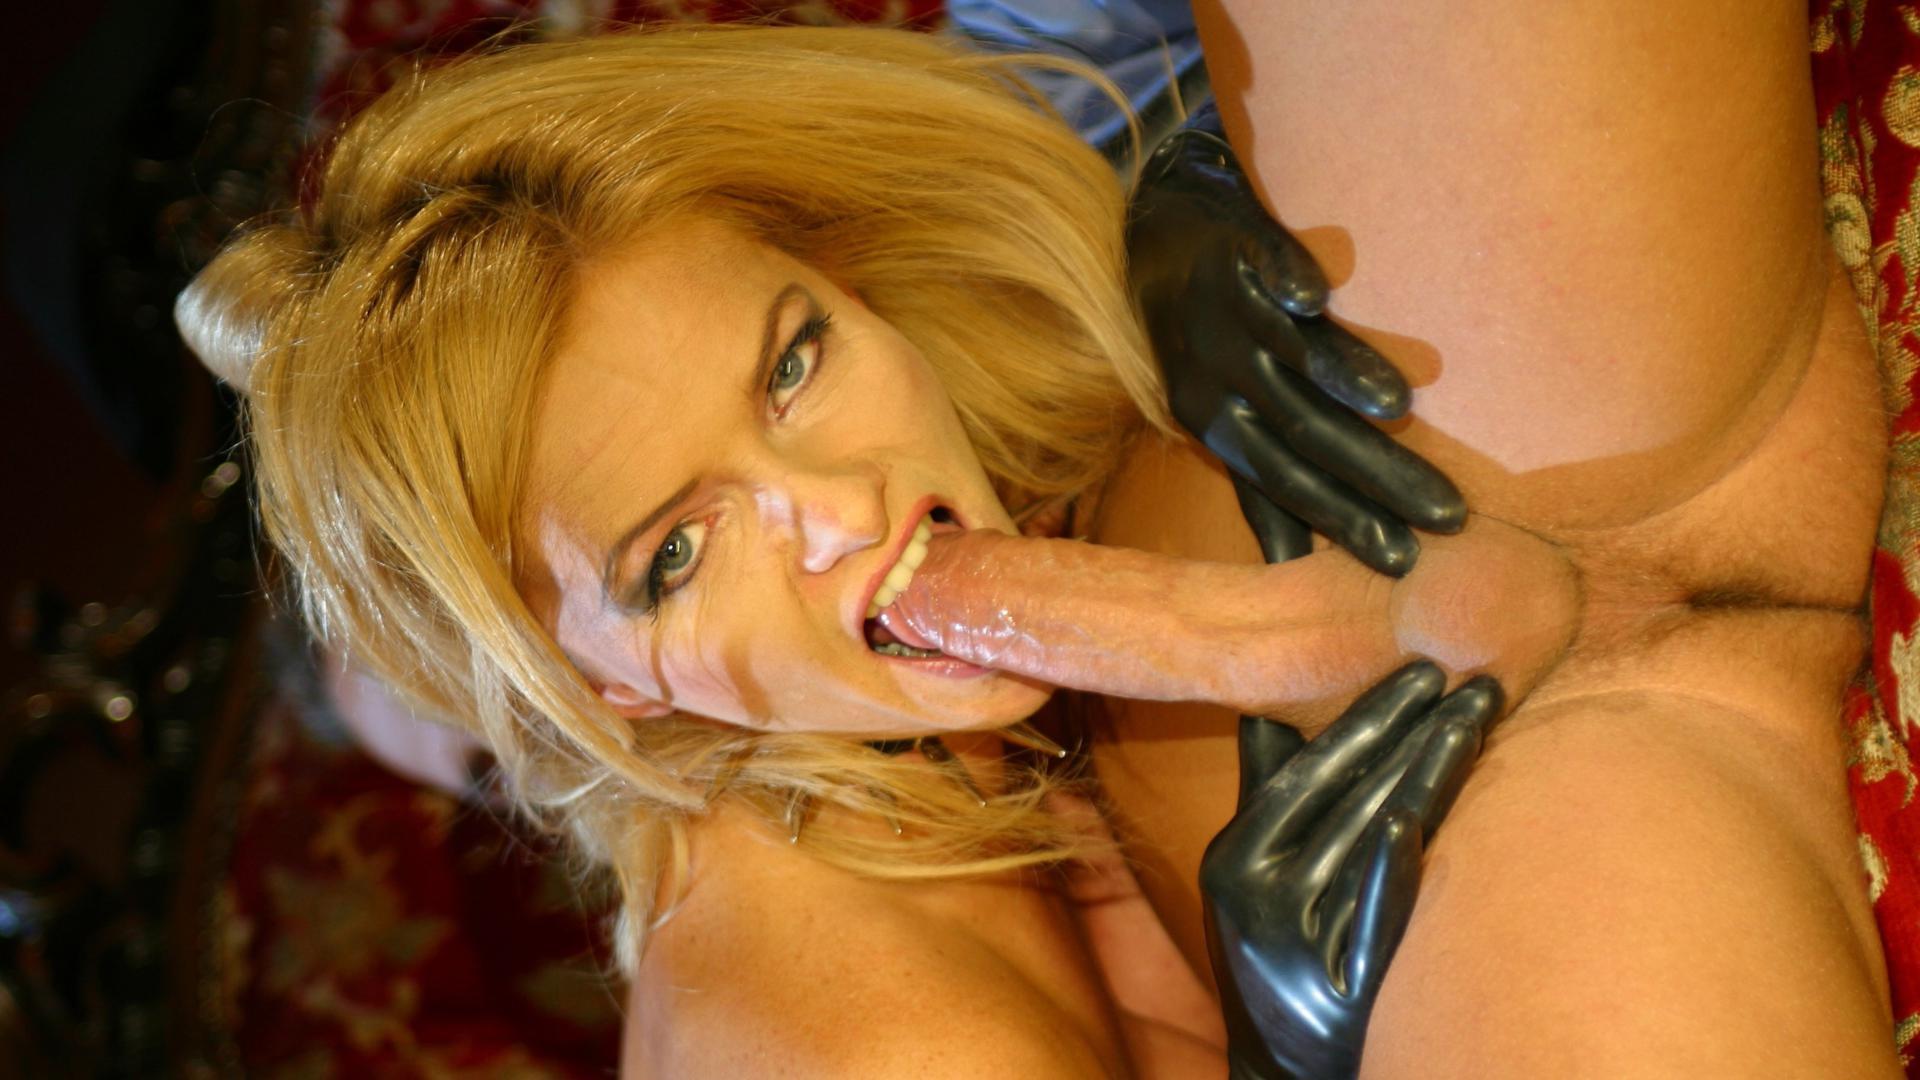 Nicometta Blue Porn download photo 1920x1080, blonde, busty, milf, adult model